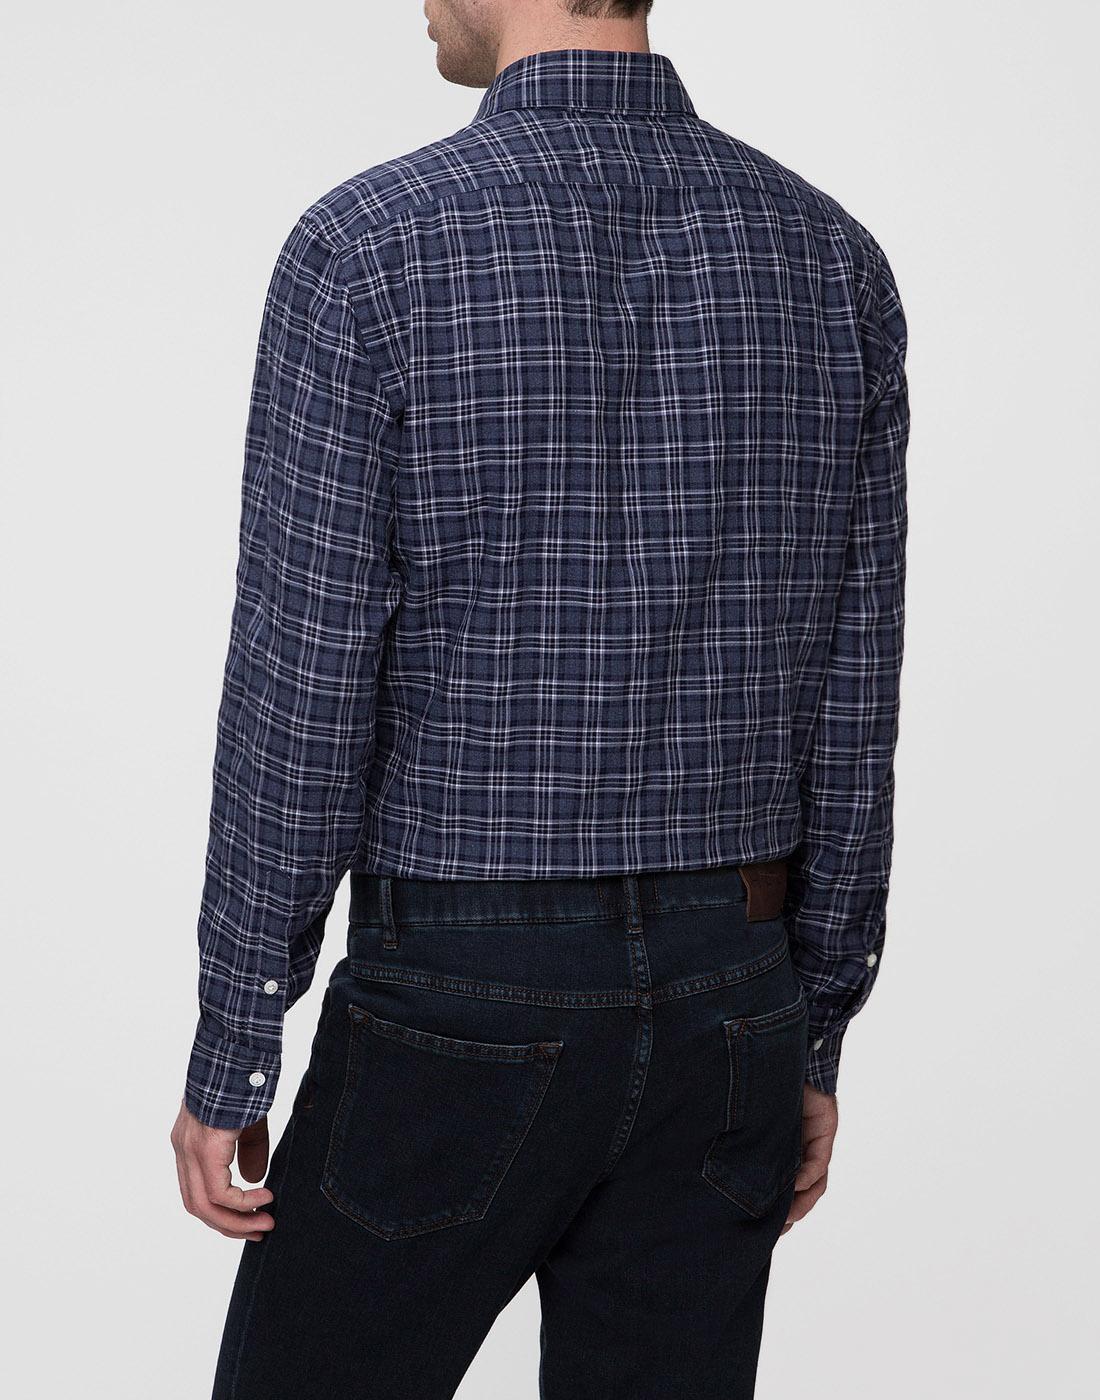 Мужская синяя рубашка в клетку Barba SD2U133603601X-4